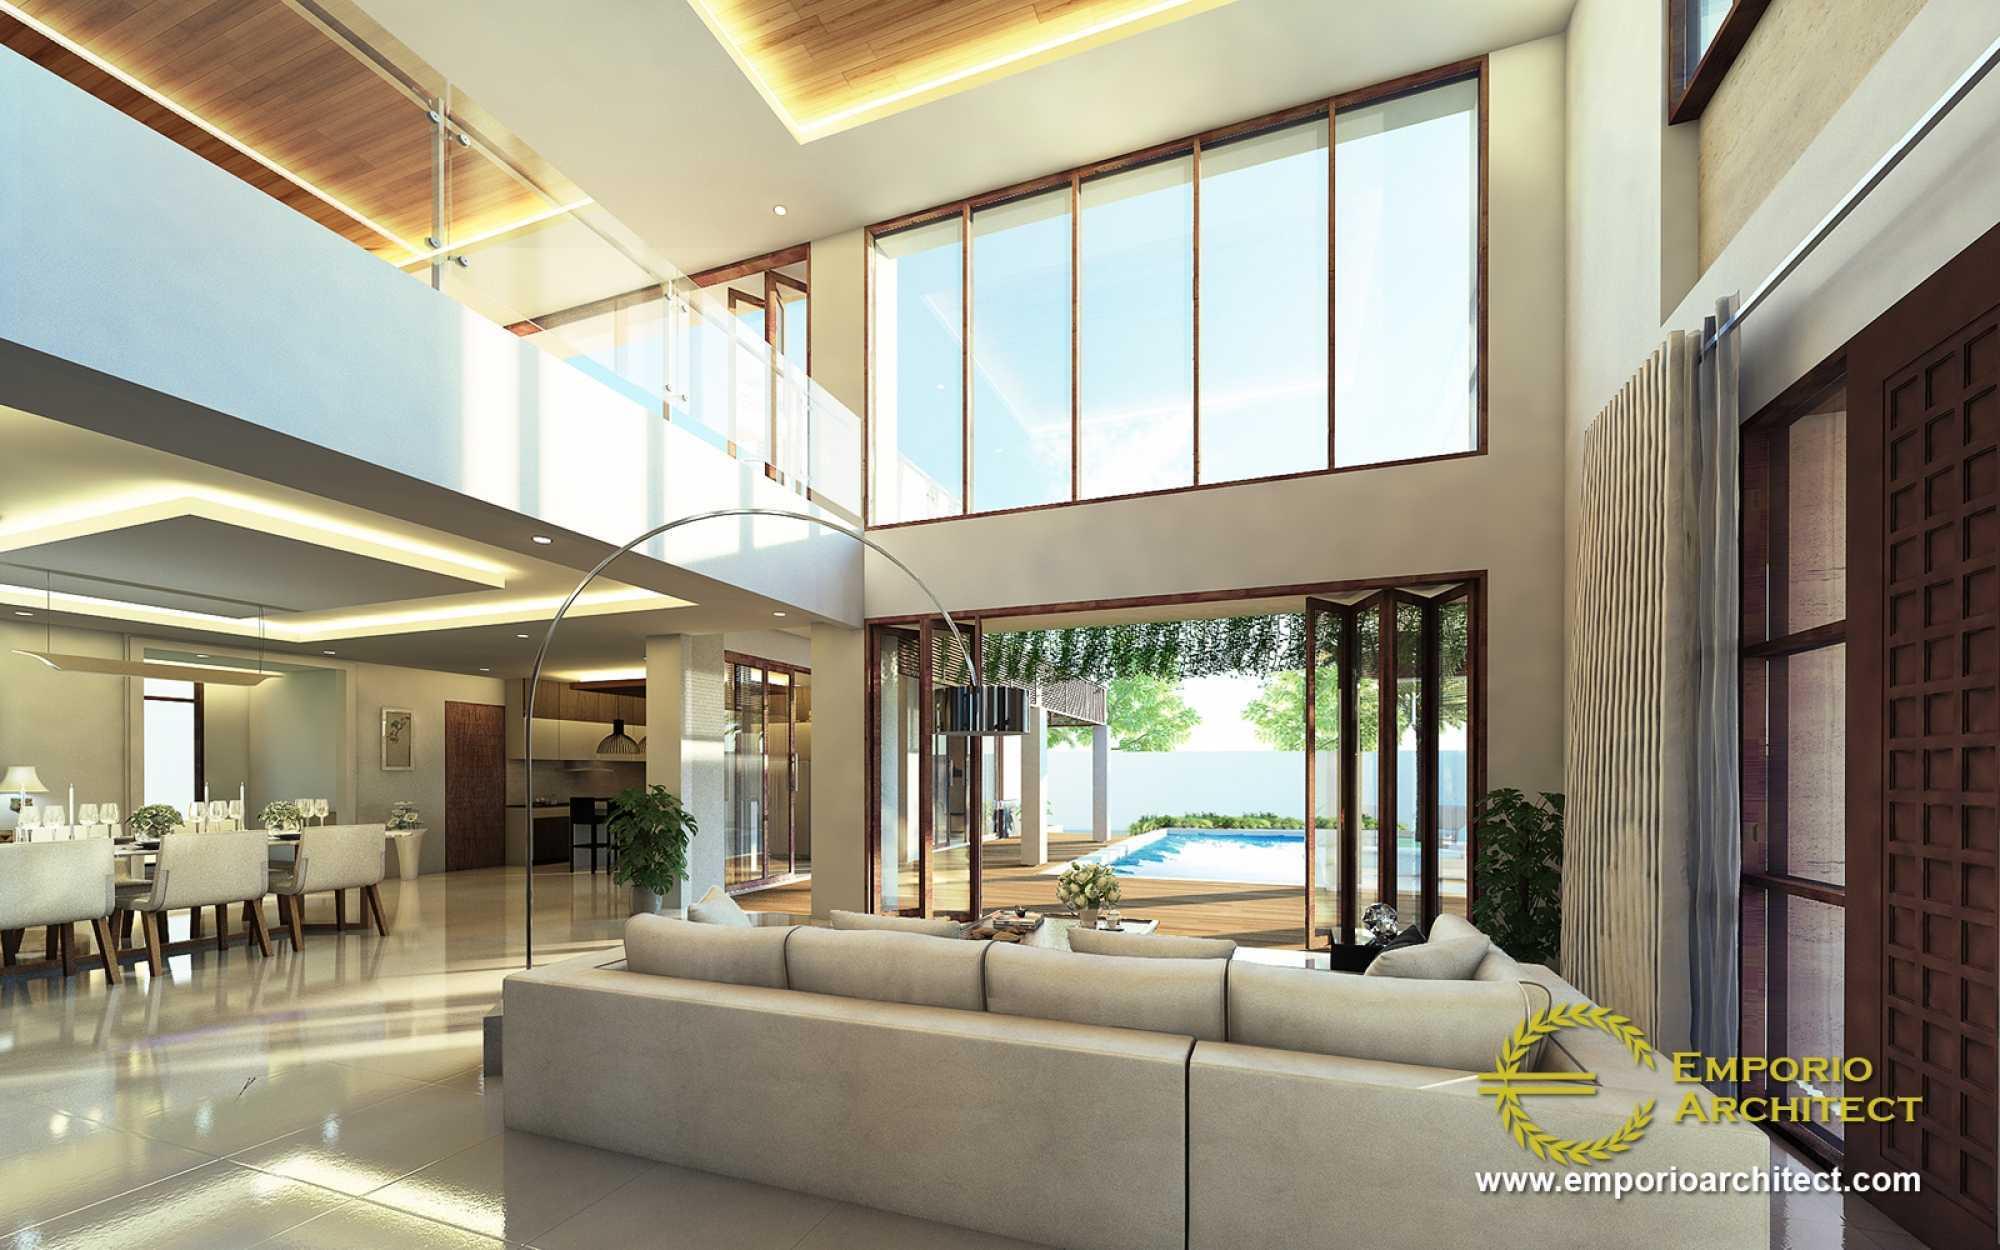 Emporio Architect Desain Rumah Villa Bali Tropis 342 @ Aceh Aceh, Indonesia Aceh, Indonesia Emporio-Architect-Desain-Rumah-Villa-Bali-Tropis-342-Aceh   75447